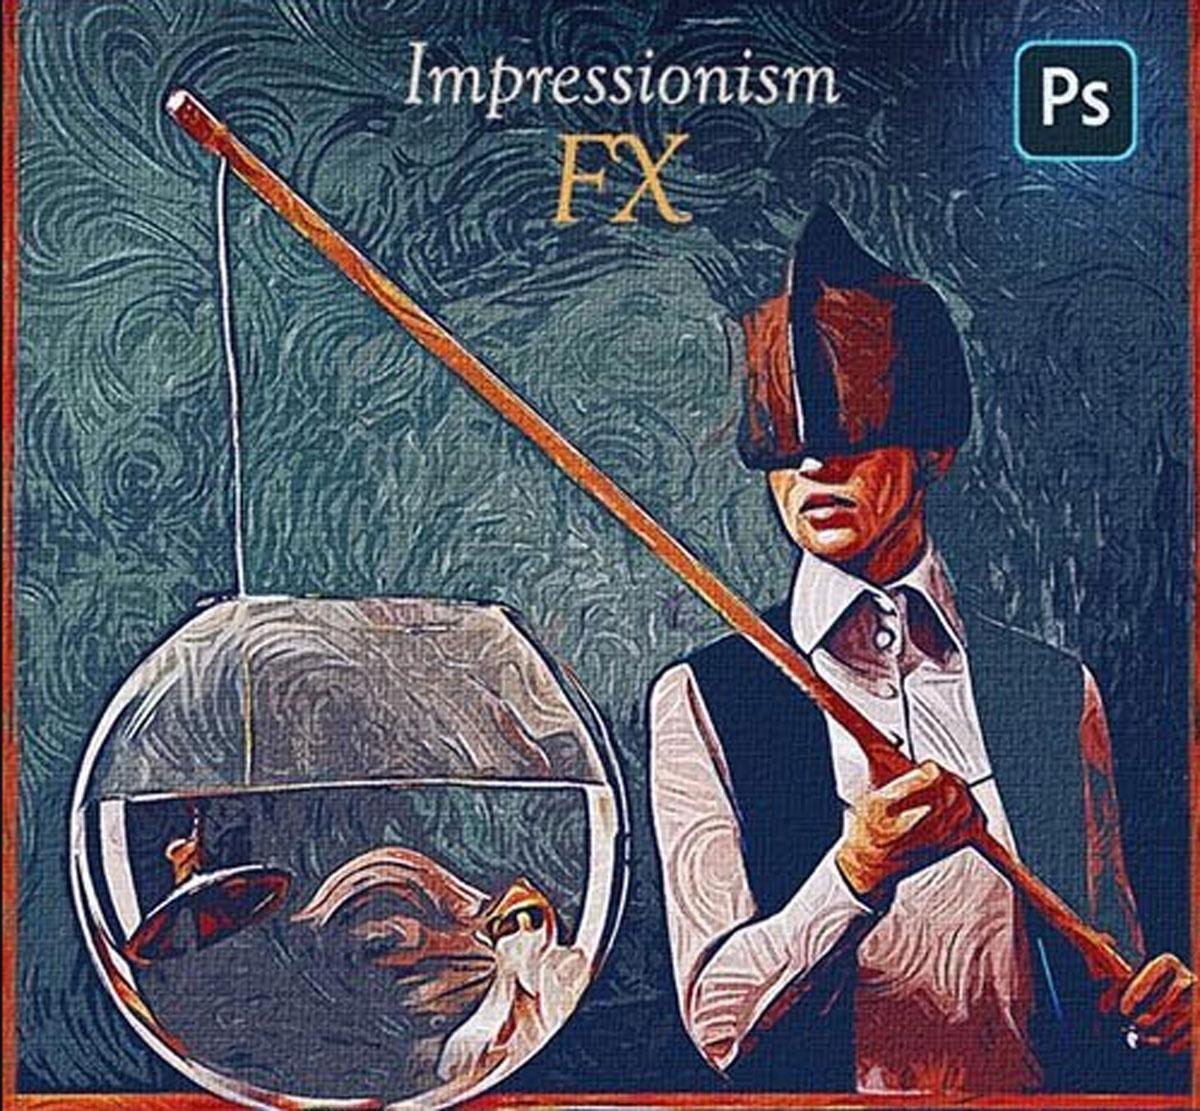 Impressionism Paint FX - Photoshop Add-On 27734189